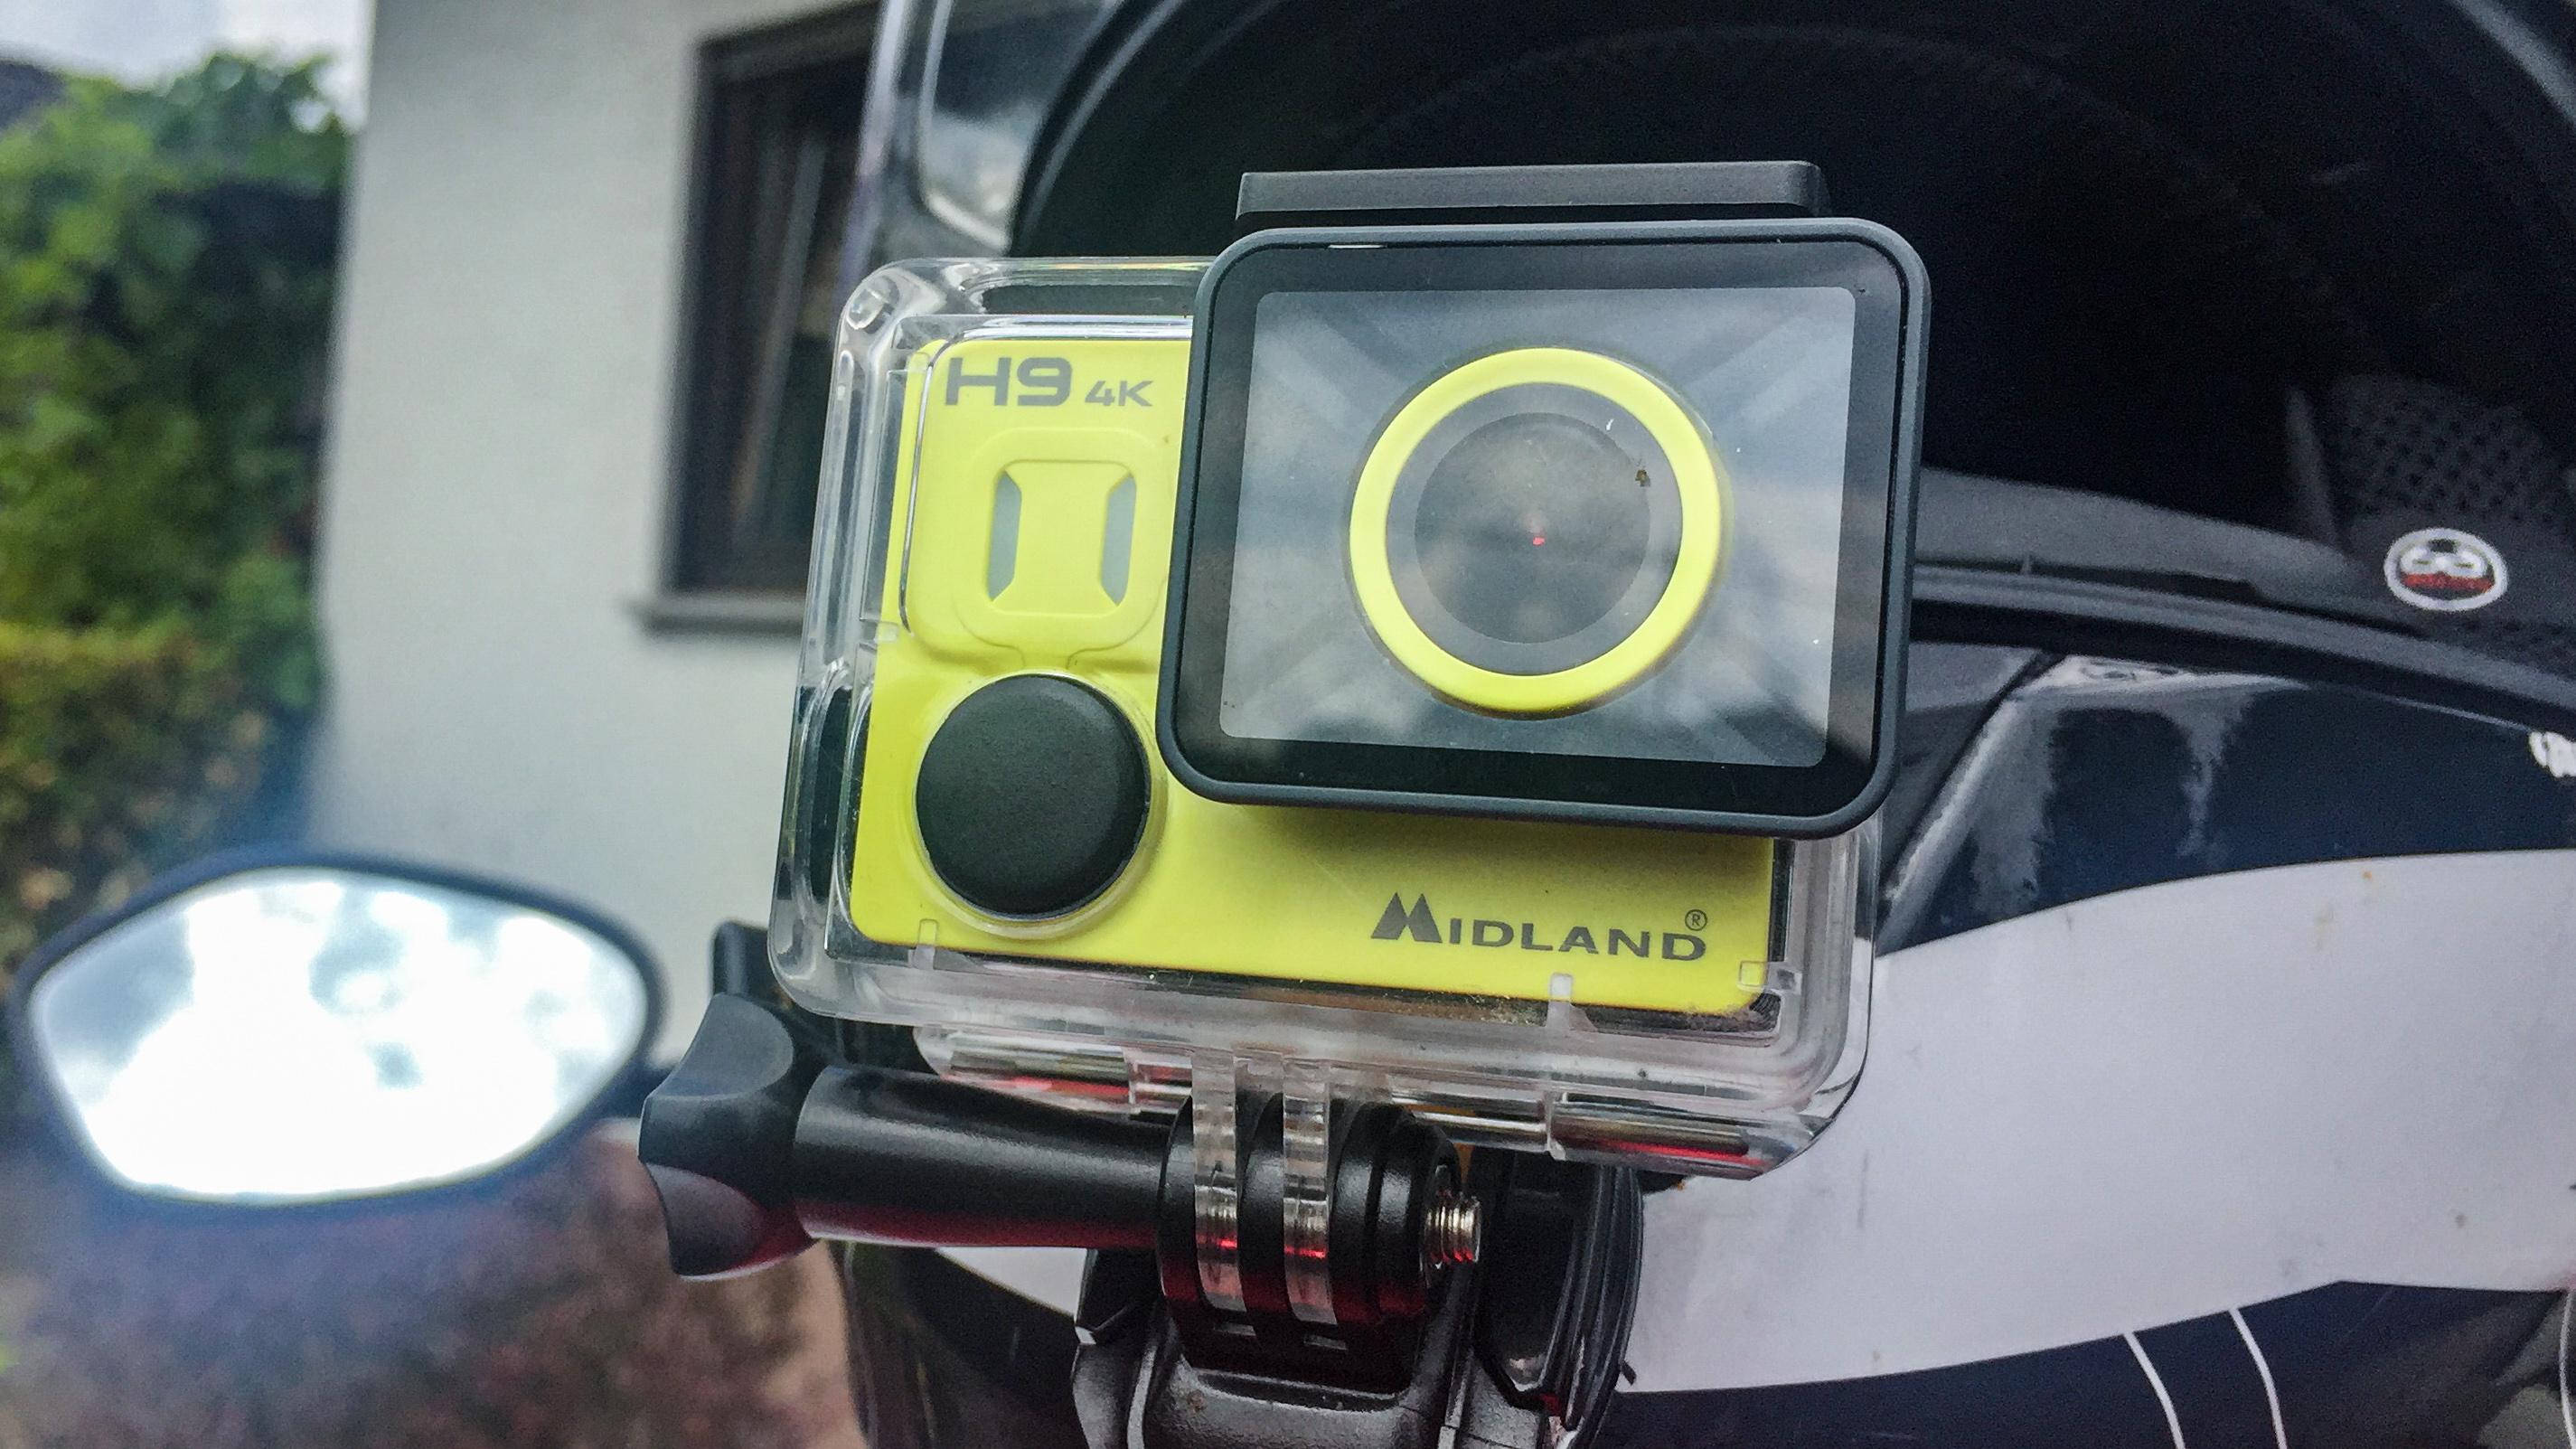 Test: Midland H9 4K Actioncam